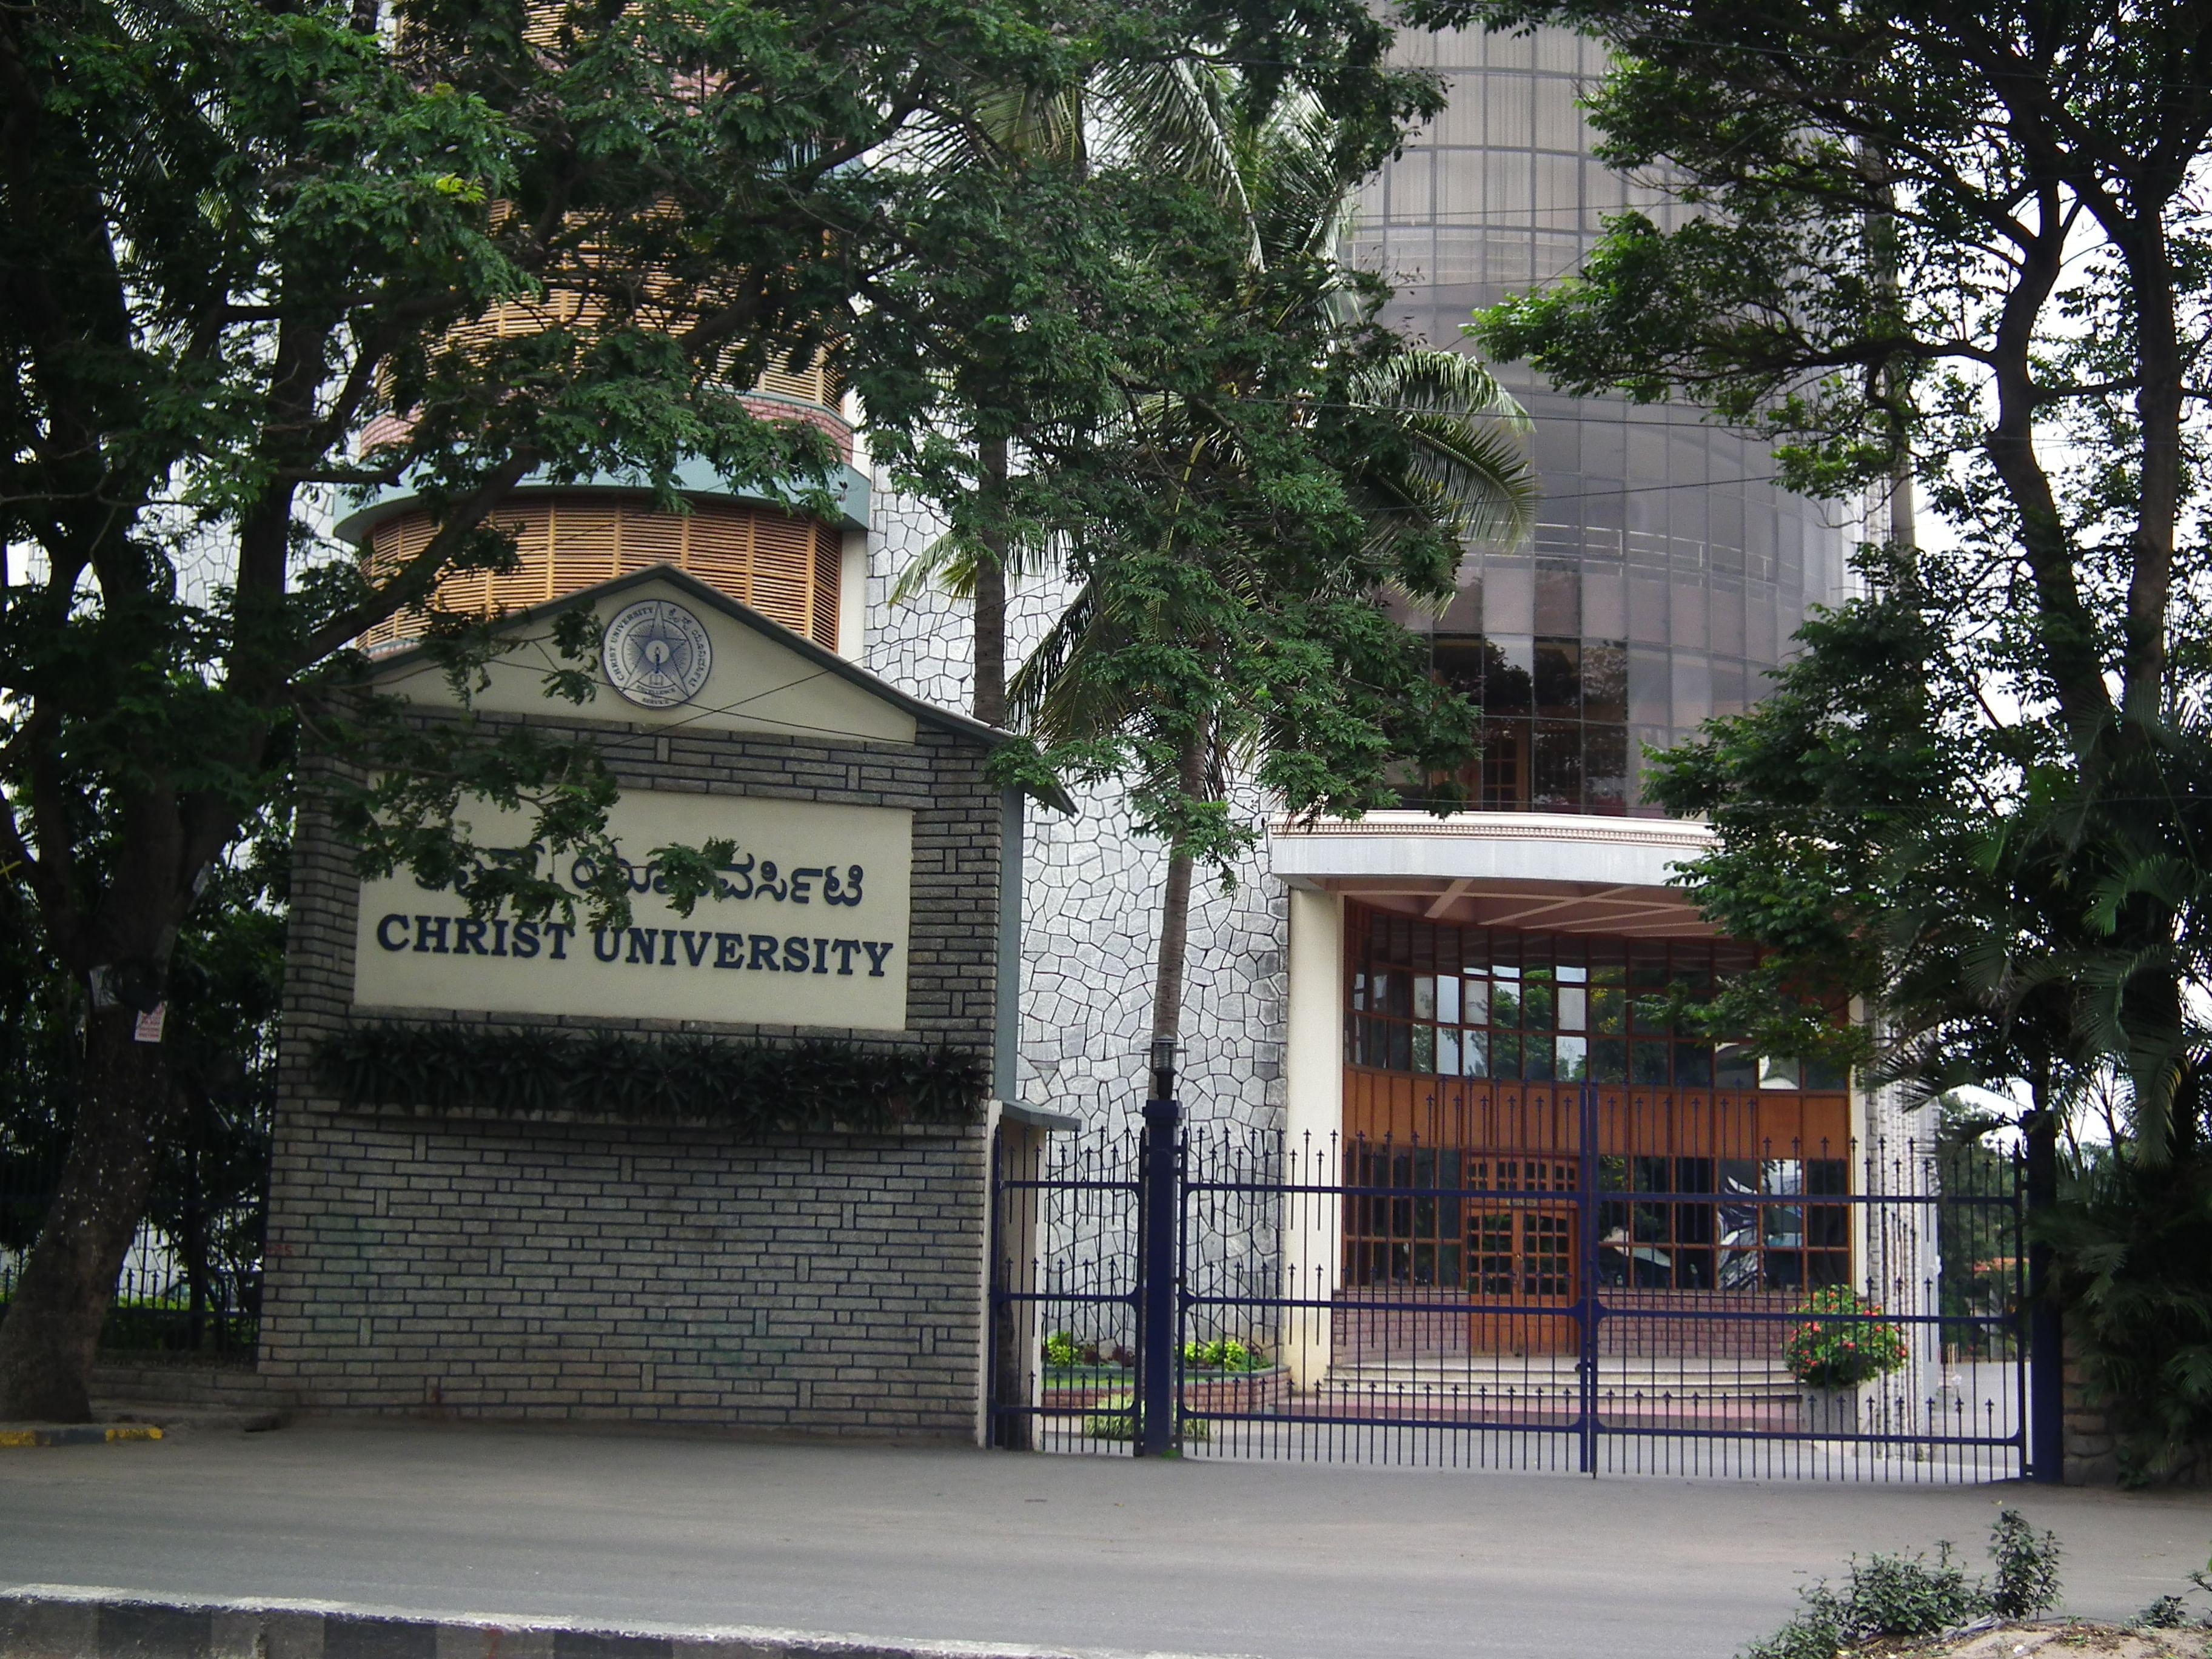 Christ_University_Hosur_road_Bangalore_4819